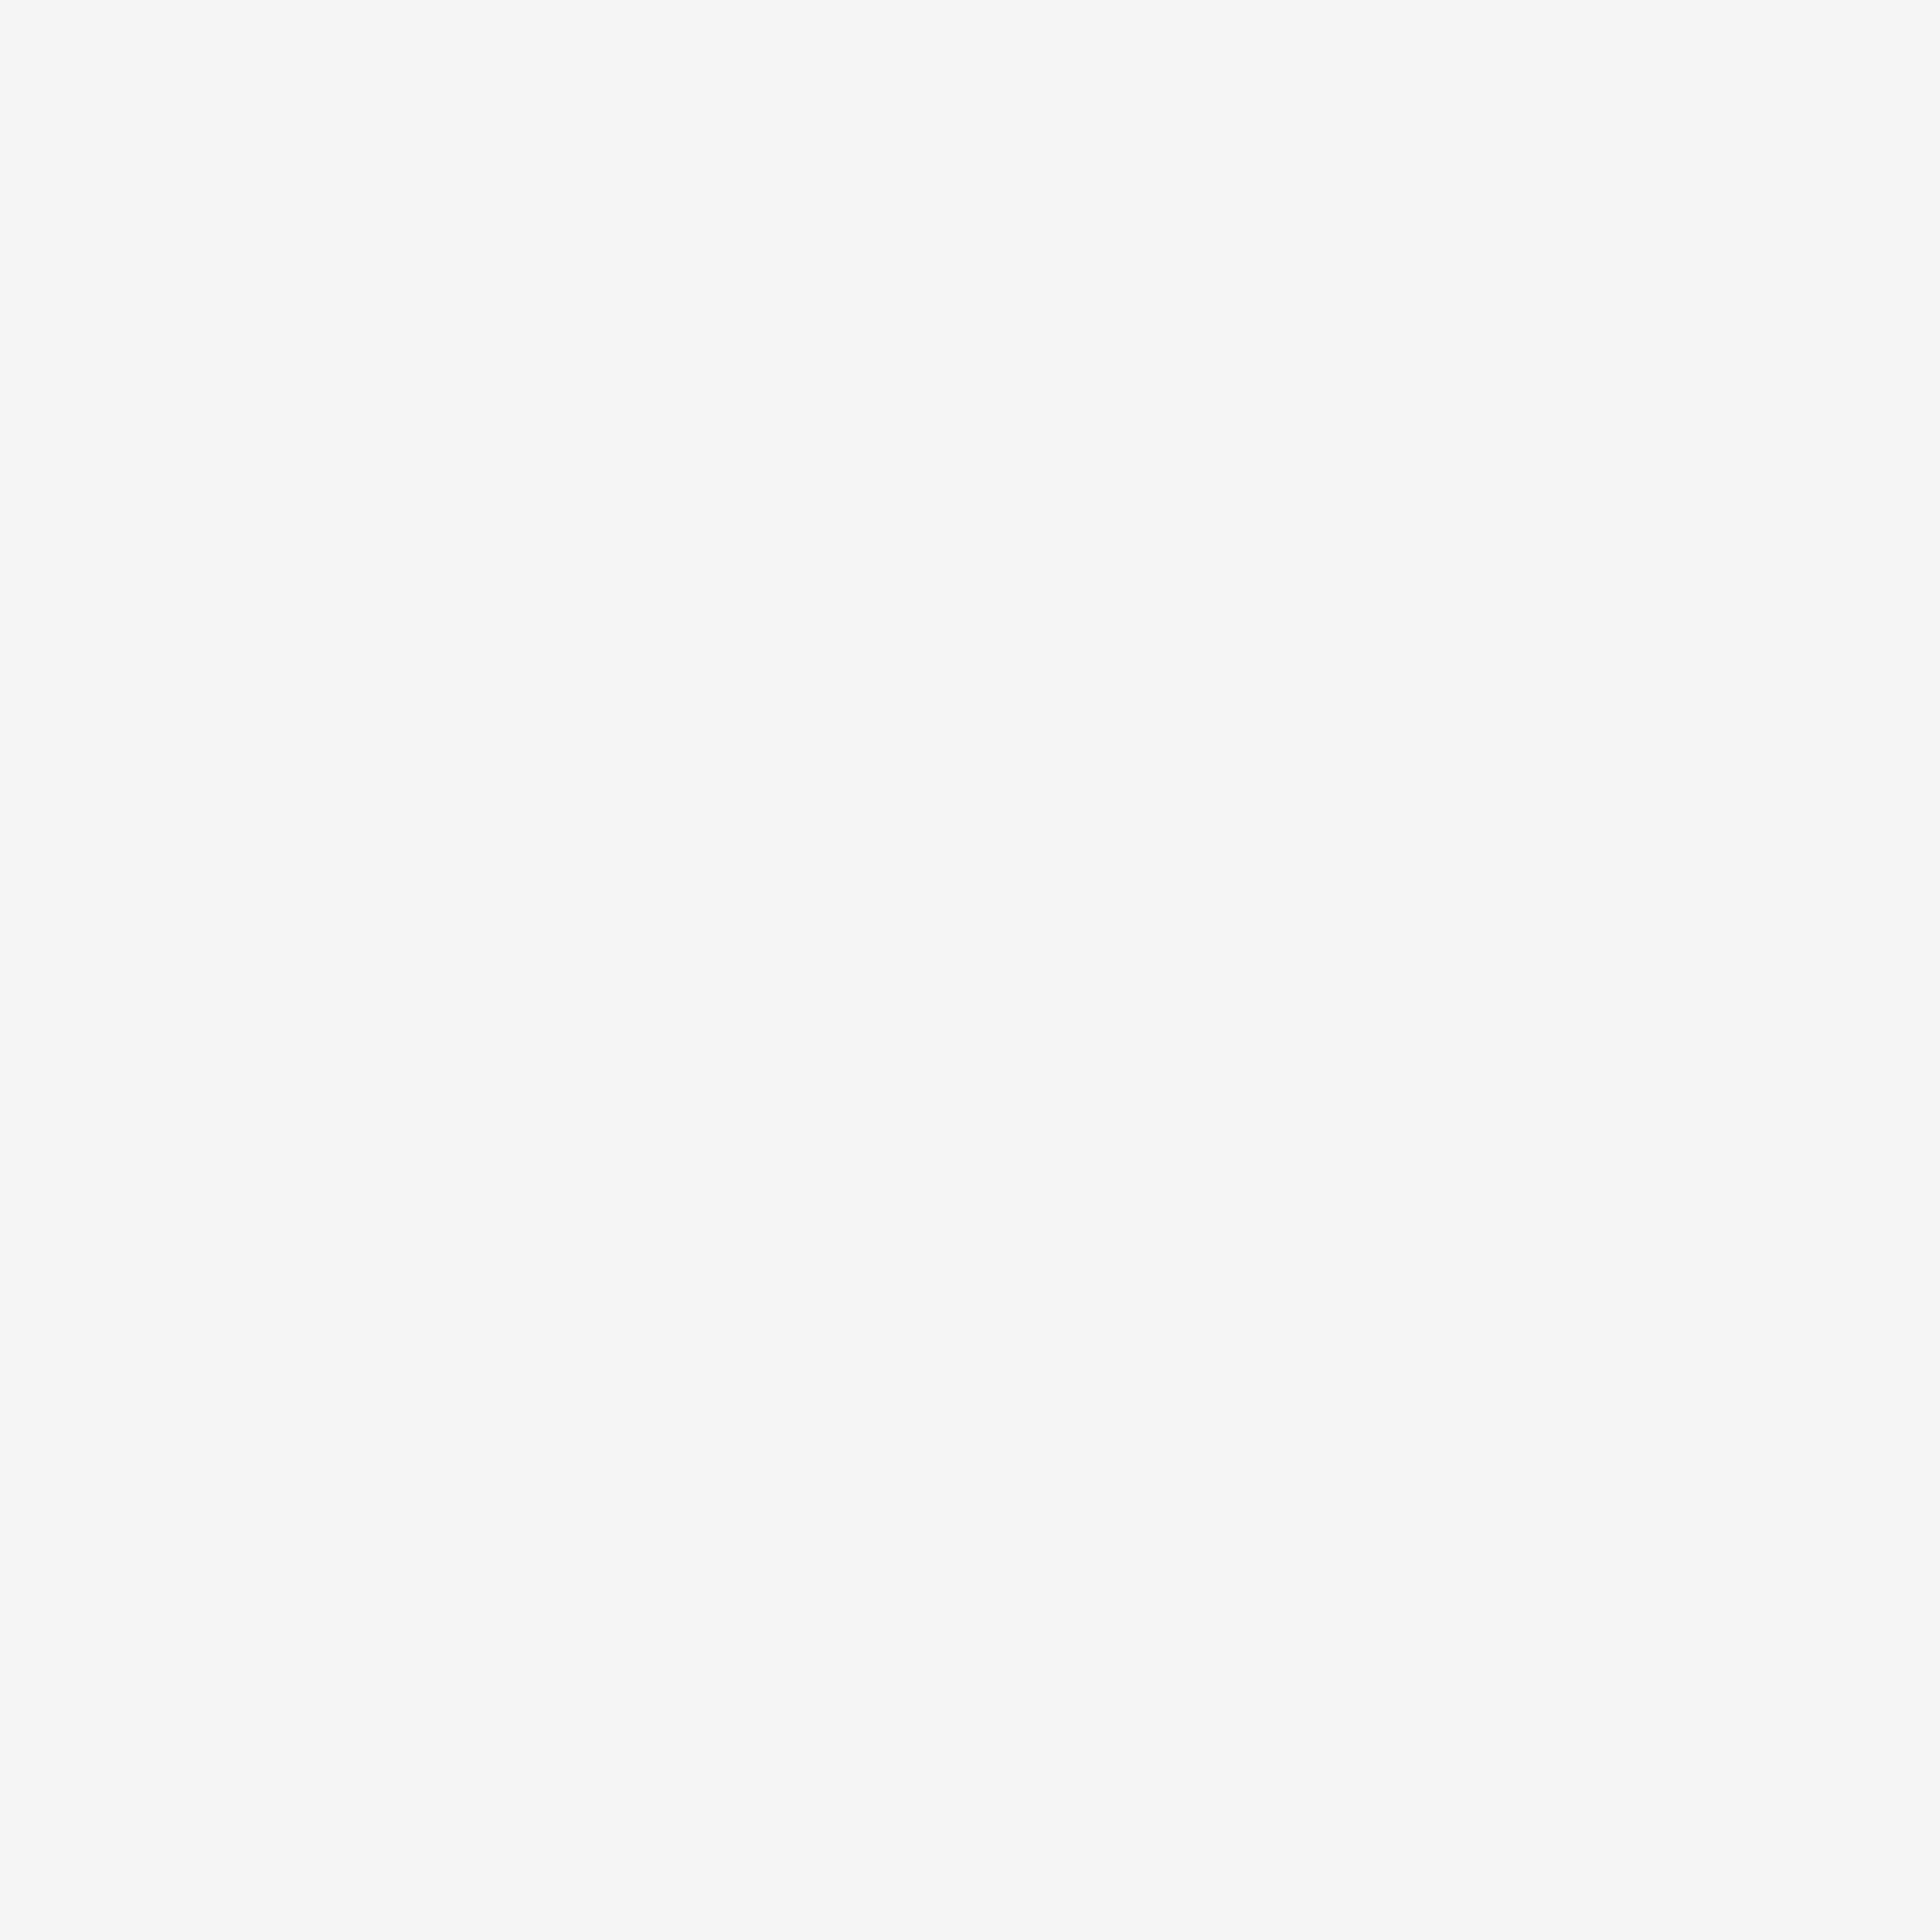 asics schoenen intersport